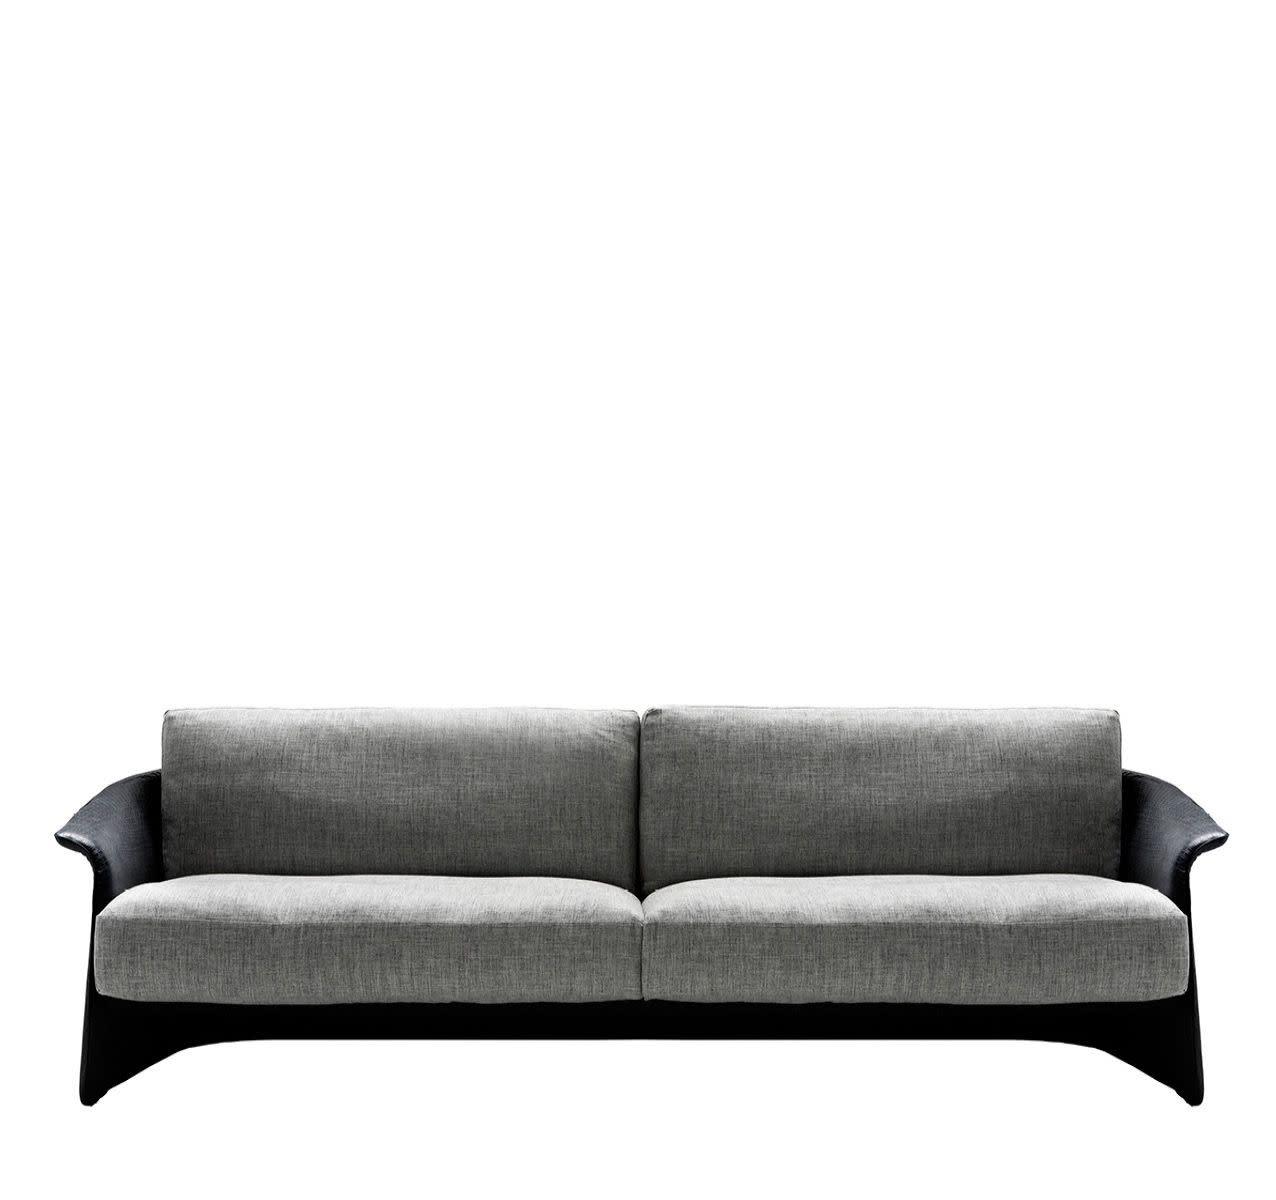 Garconne 2 - Three Seater Sofa Tigri - Arancione 5360, Cairo - Bianco 01